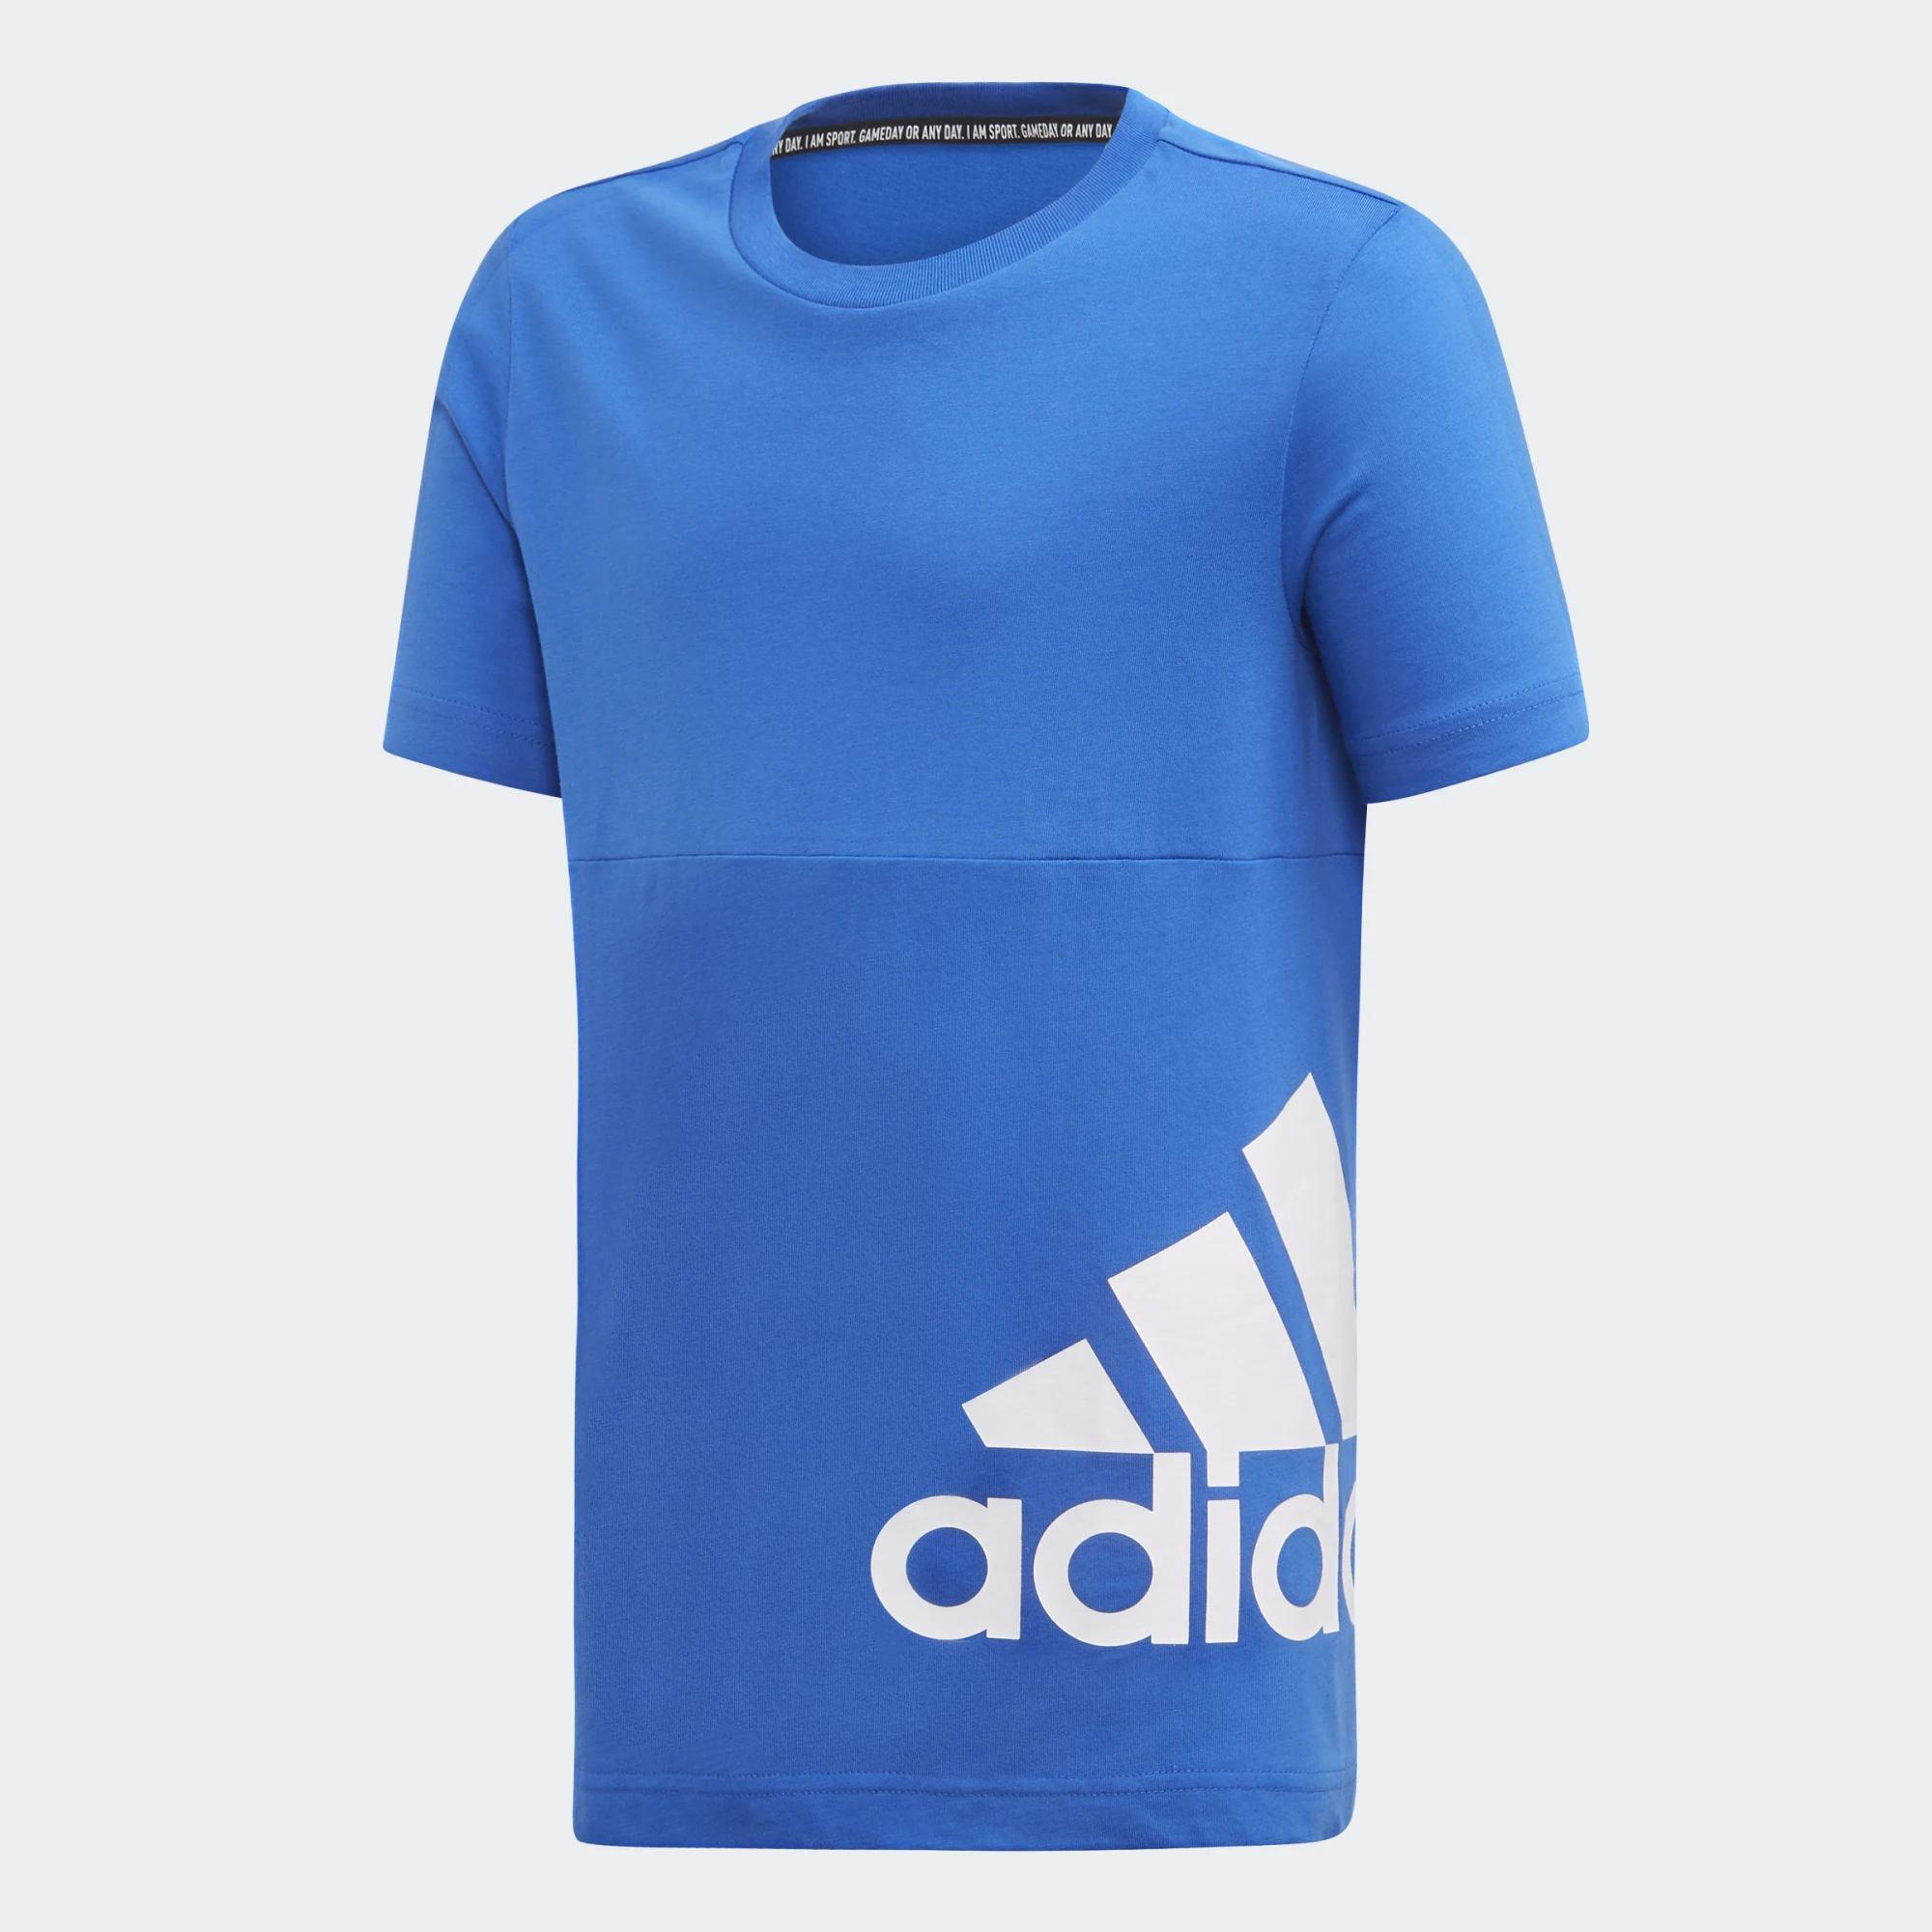 adidas Must Haves Badge of Sport Tee (9000032472_3450)